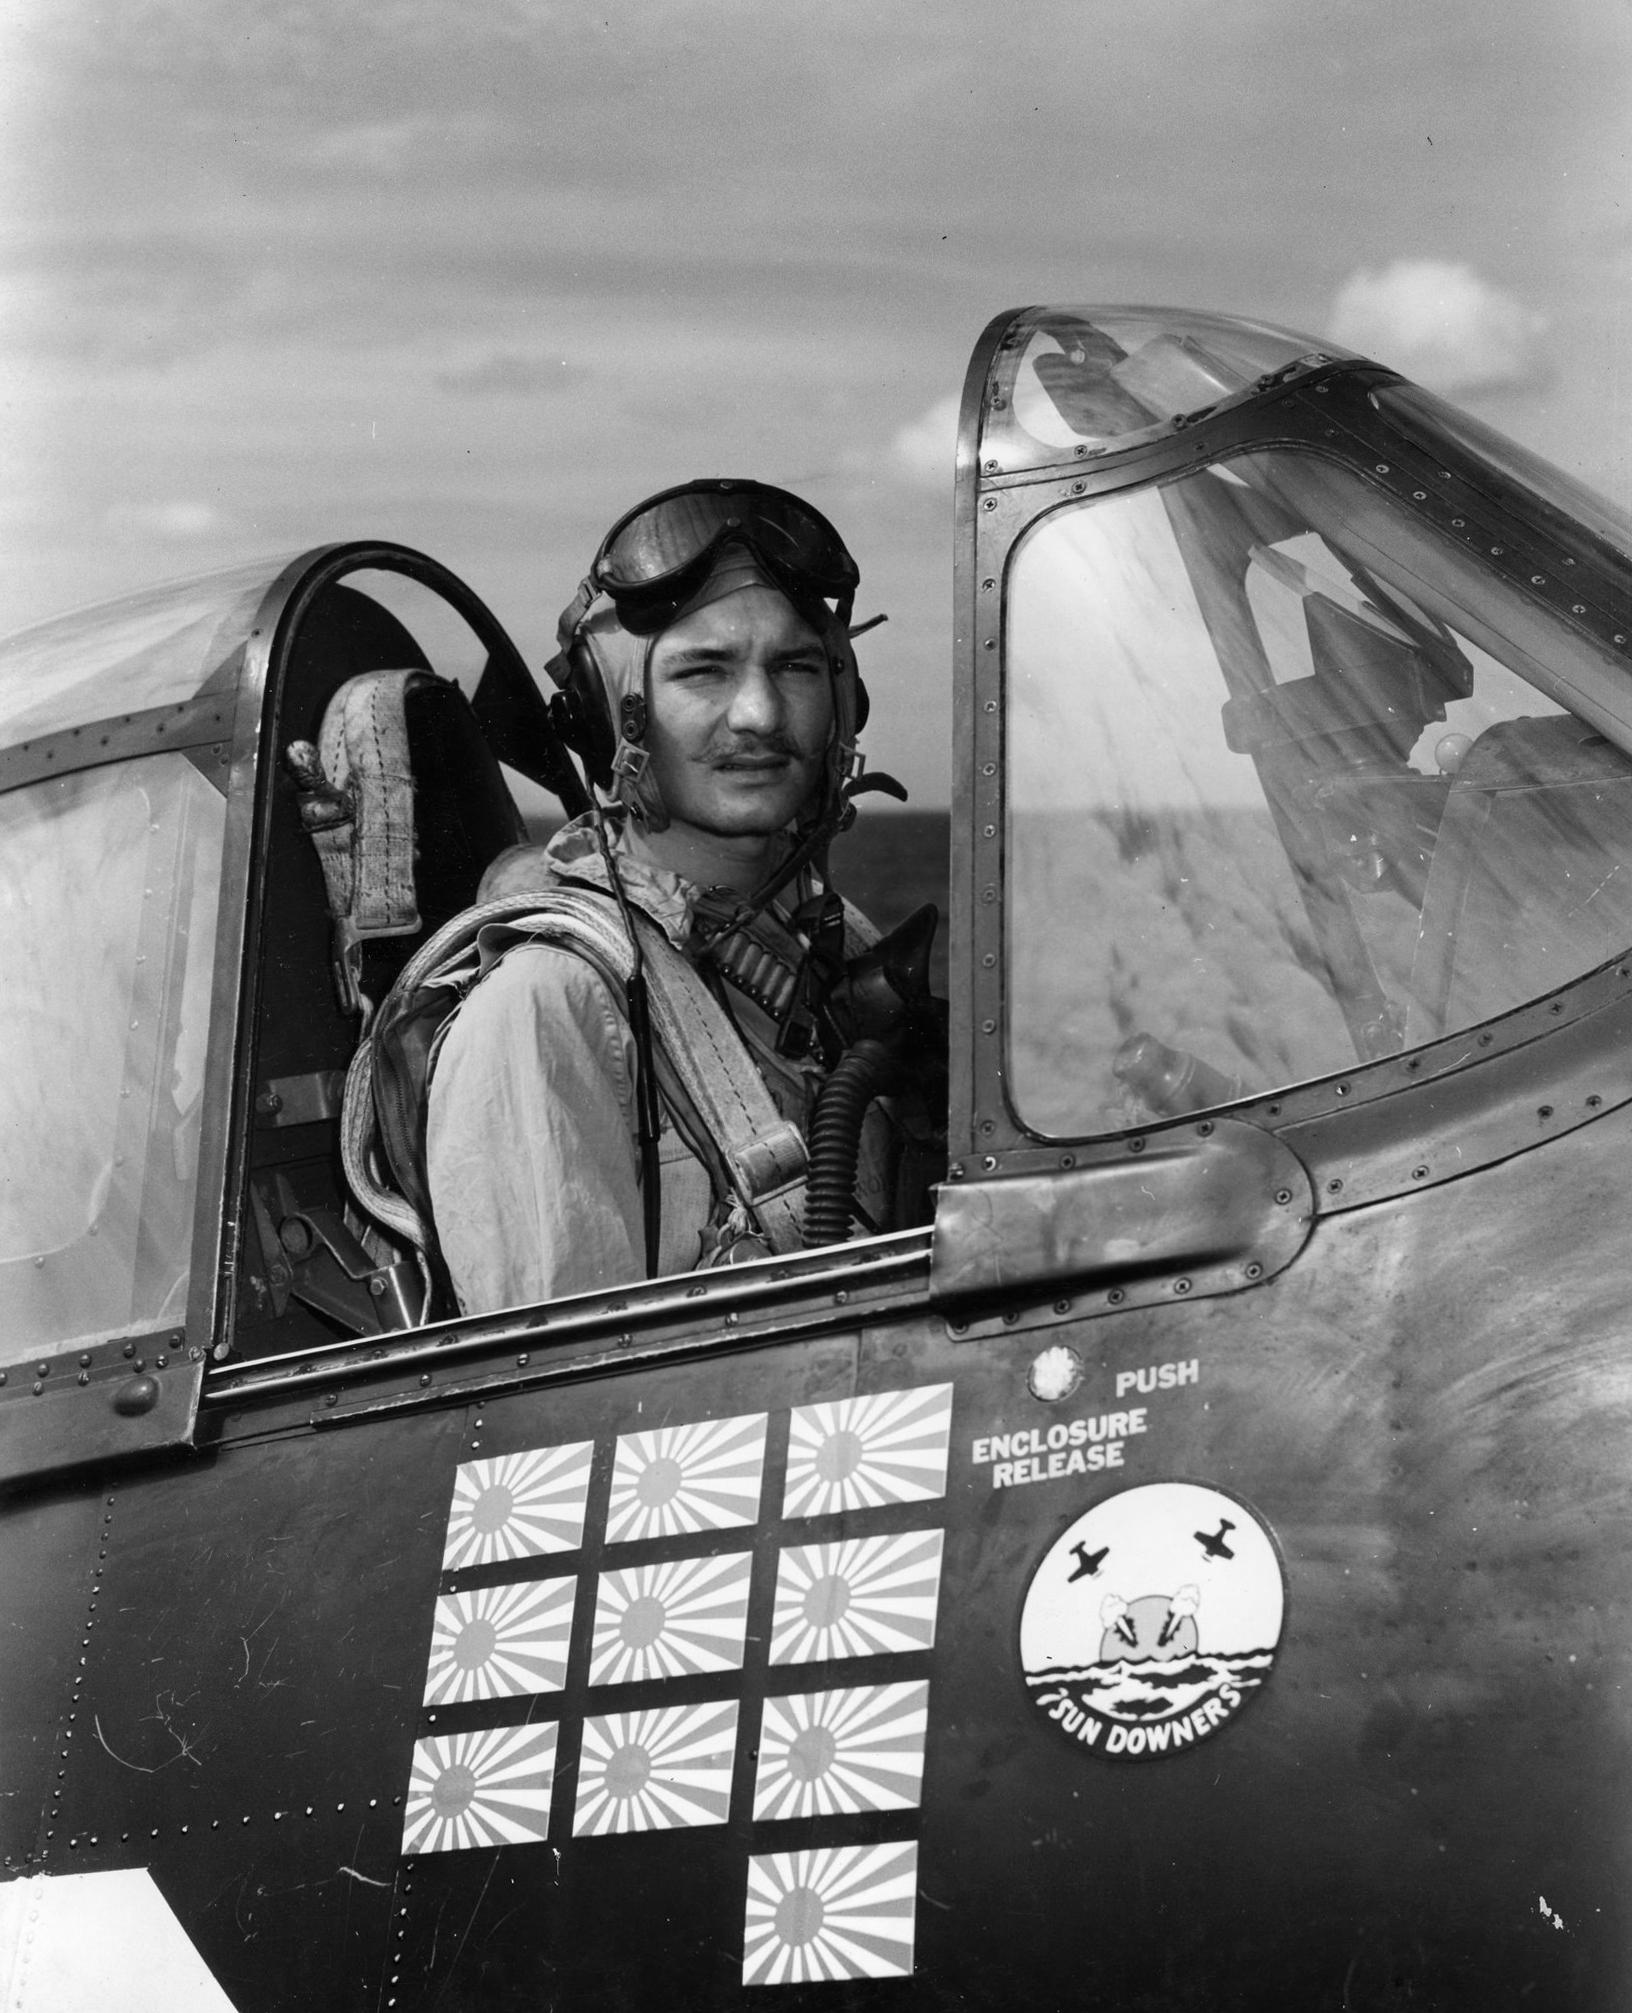 Aircrew USN VF 11 ace Lt James E Swope scored 10 01